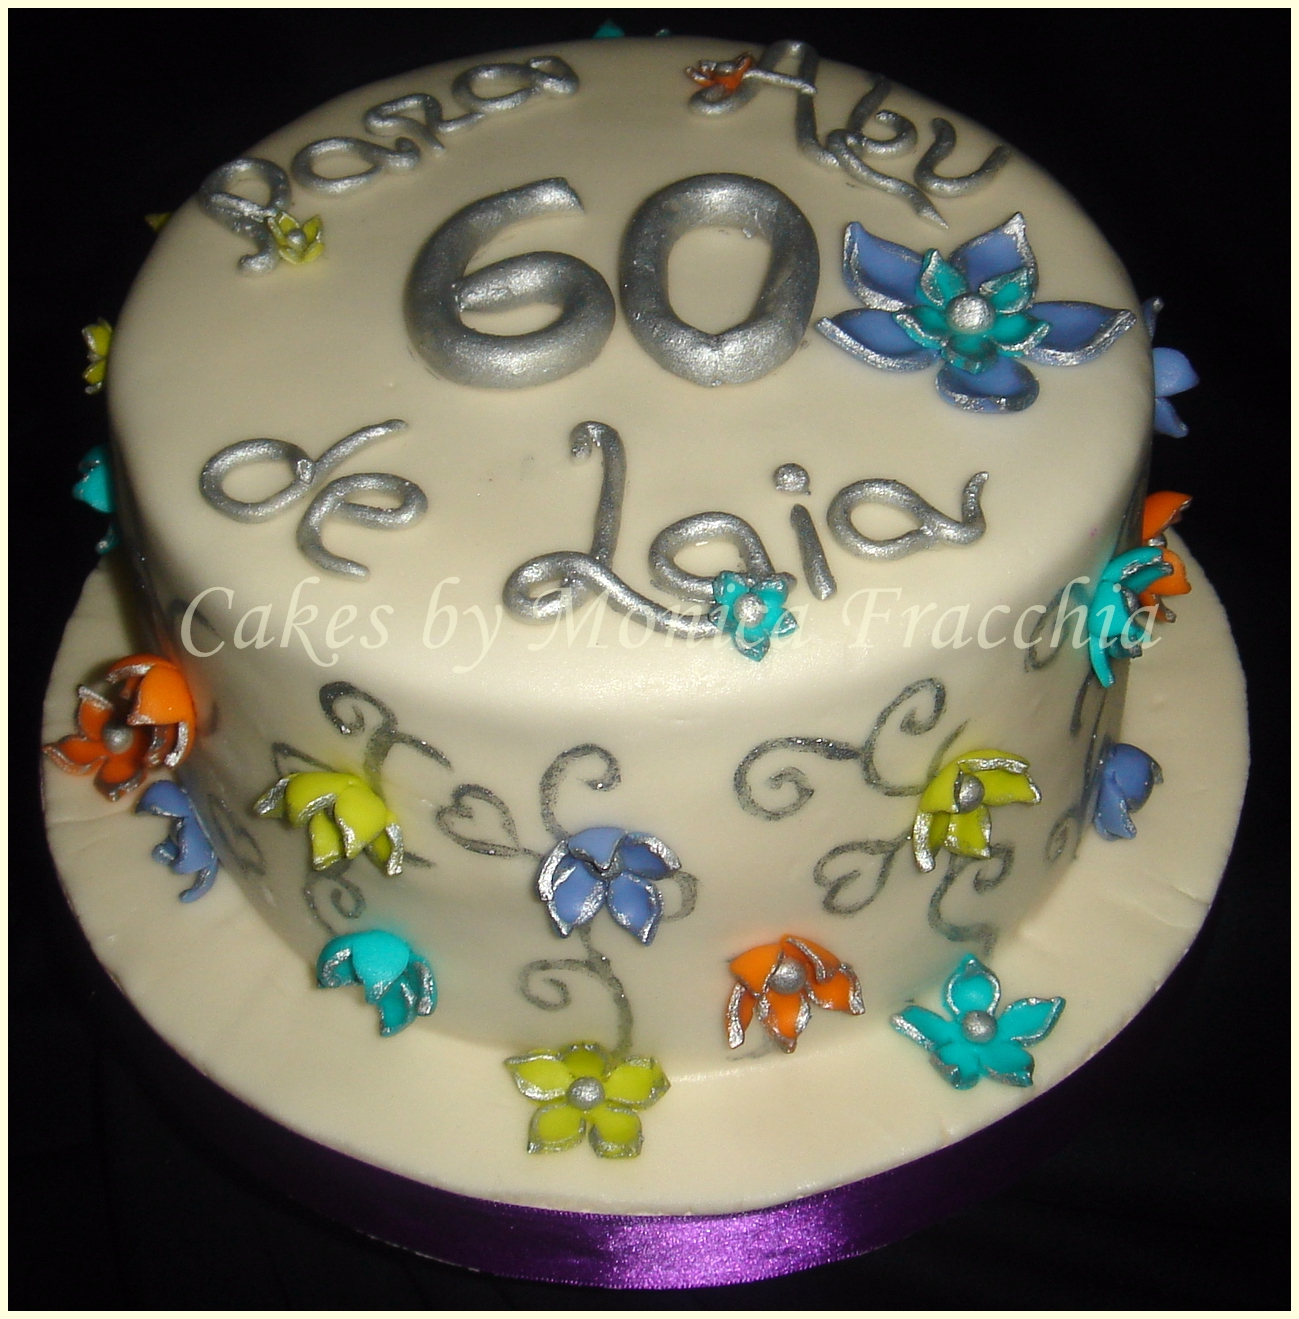 Torta Decorada De Flores Para La Abuela Tortas Cakes By Monica